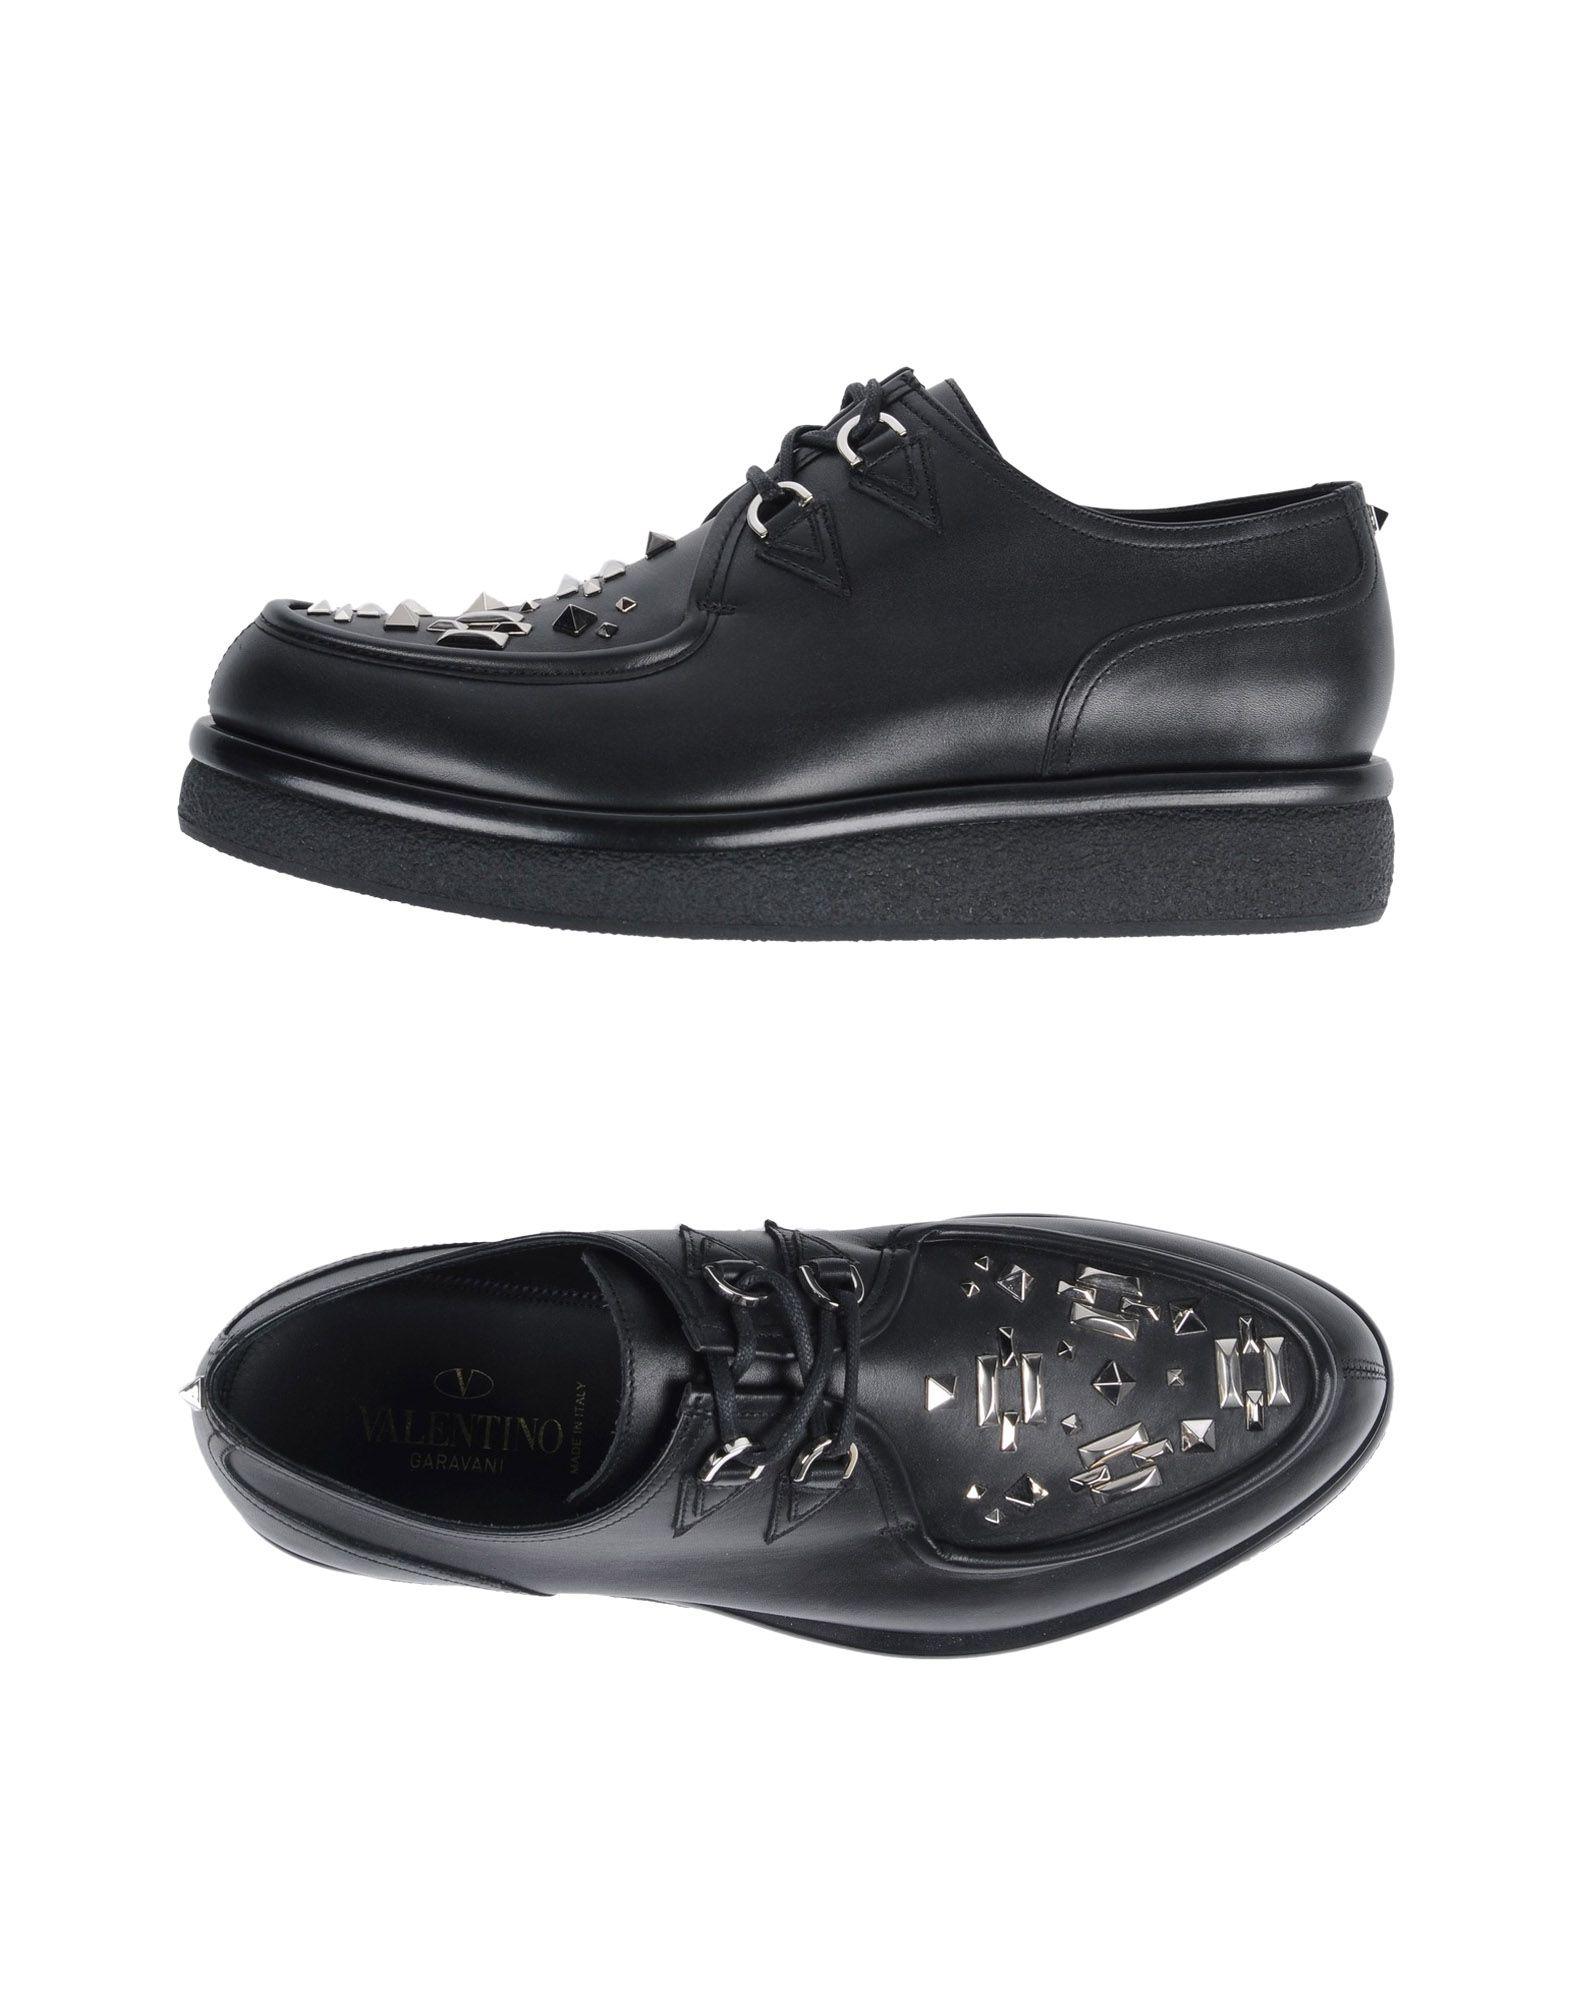 Zapatos de mujer baratos zapatos de mujer Mujer Zapato De Cordones Valtino Garavani Mujer mujer - Zapatos De Cordones Valtino Garavani  Negro 6b1c69